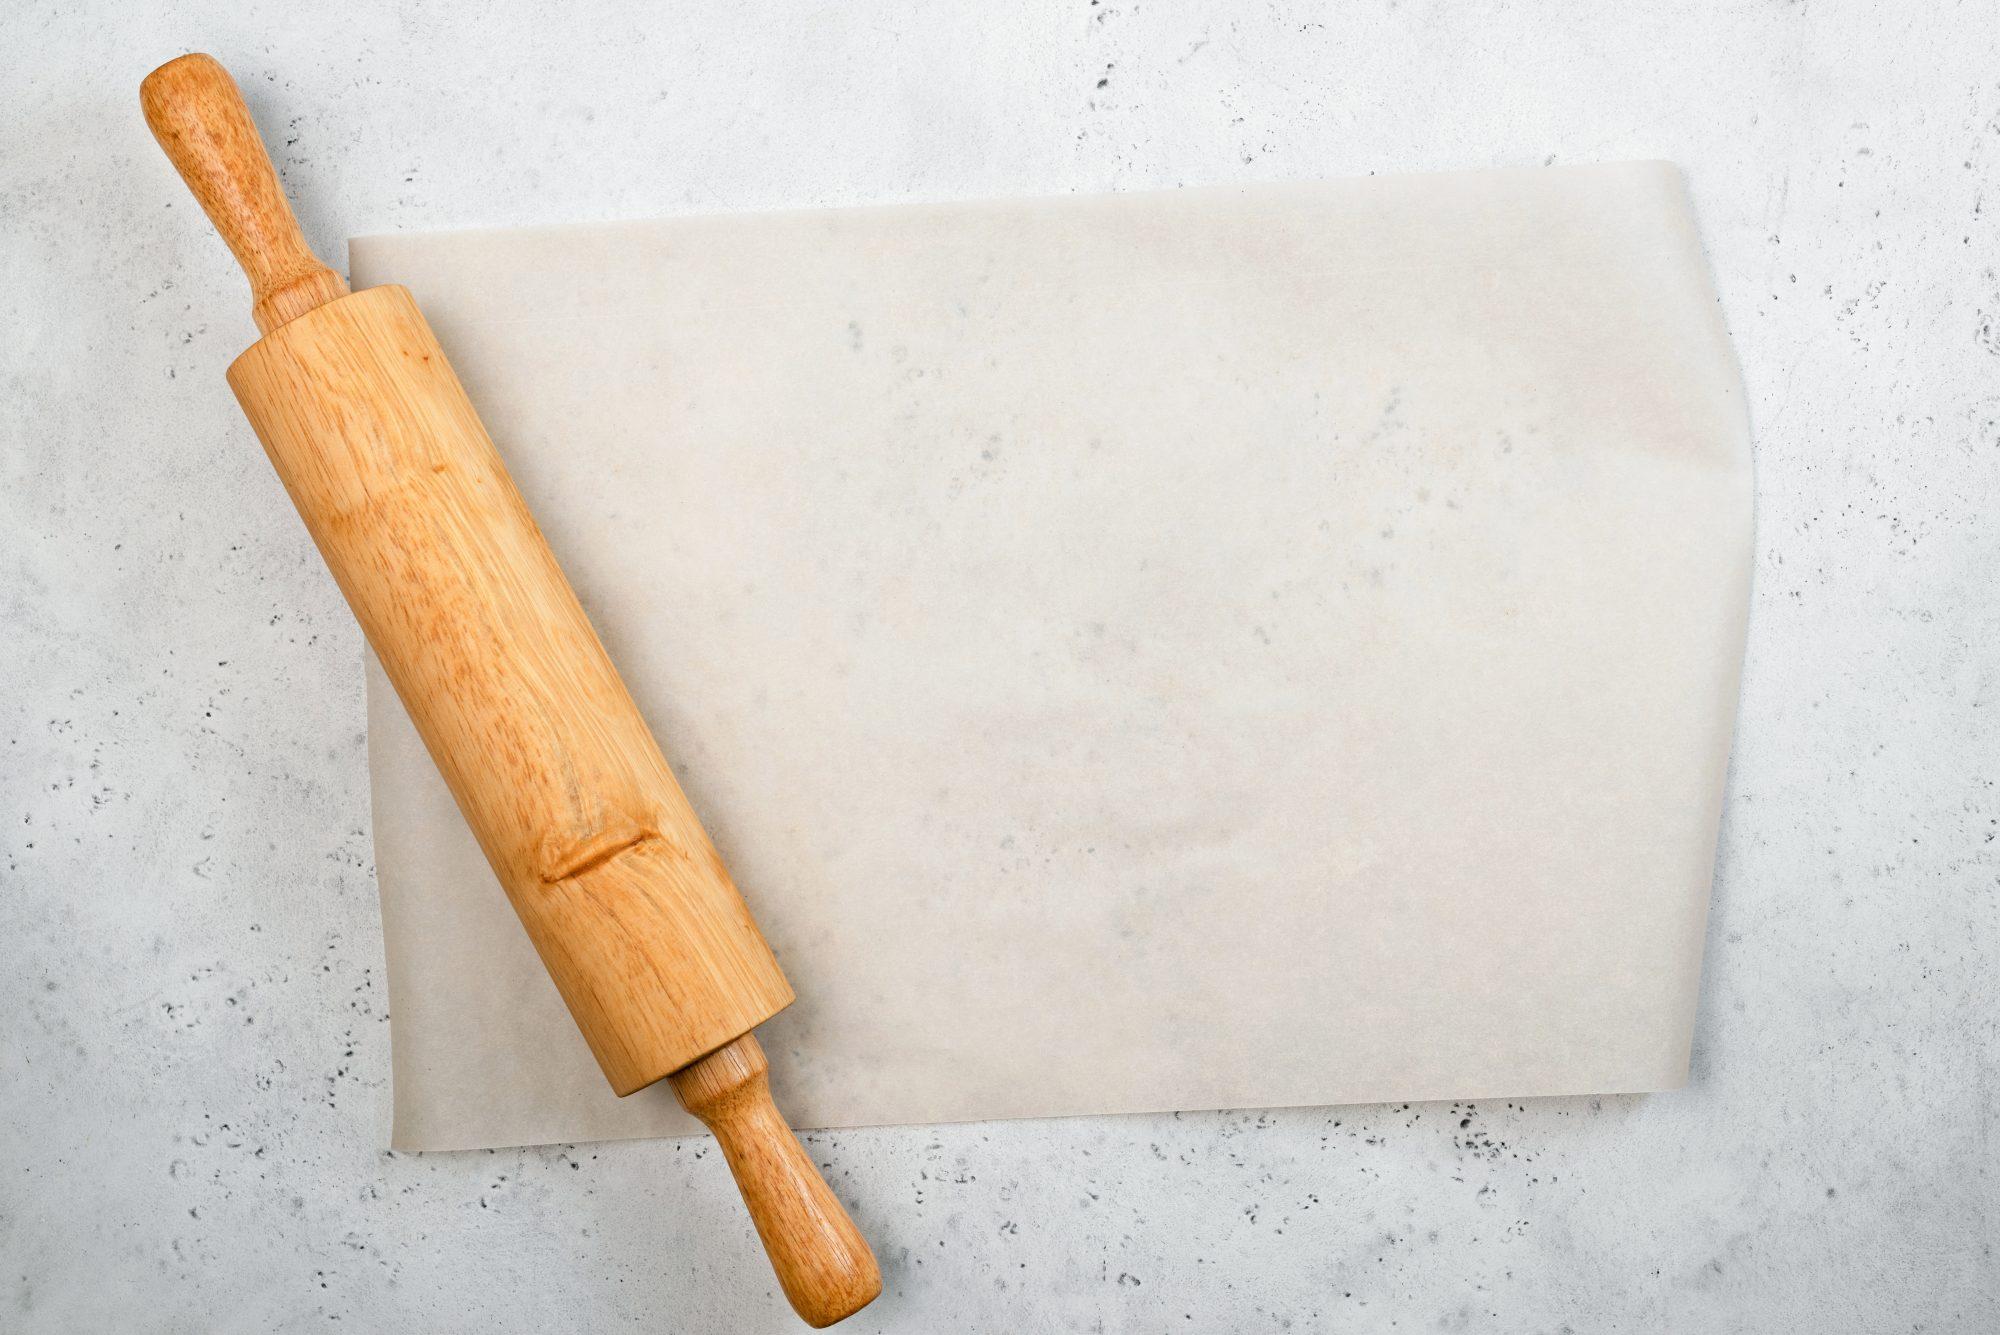 Wax paper tout Getty 9/16/20